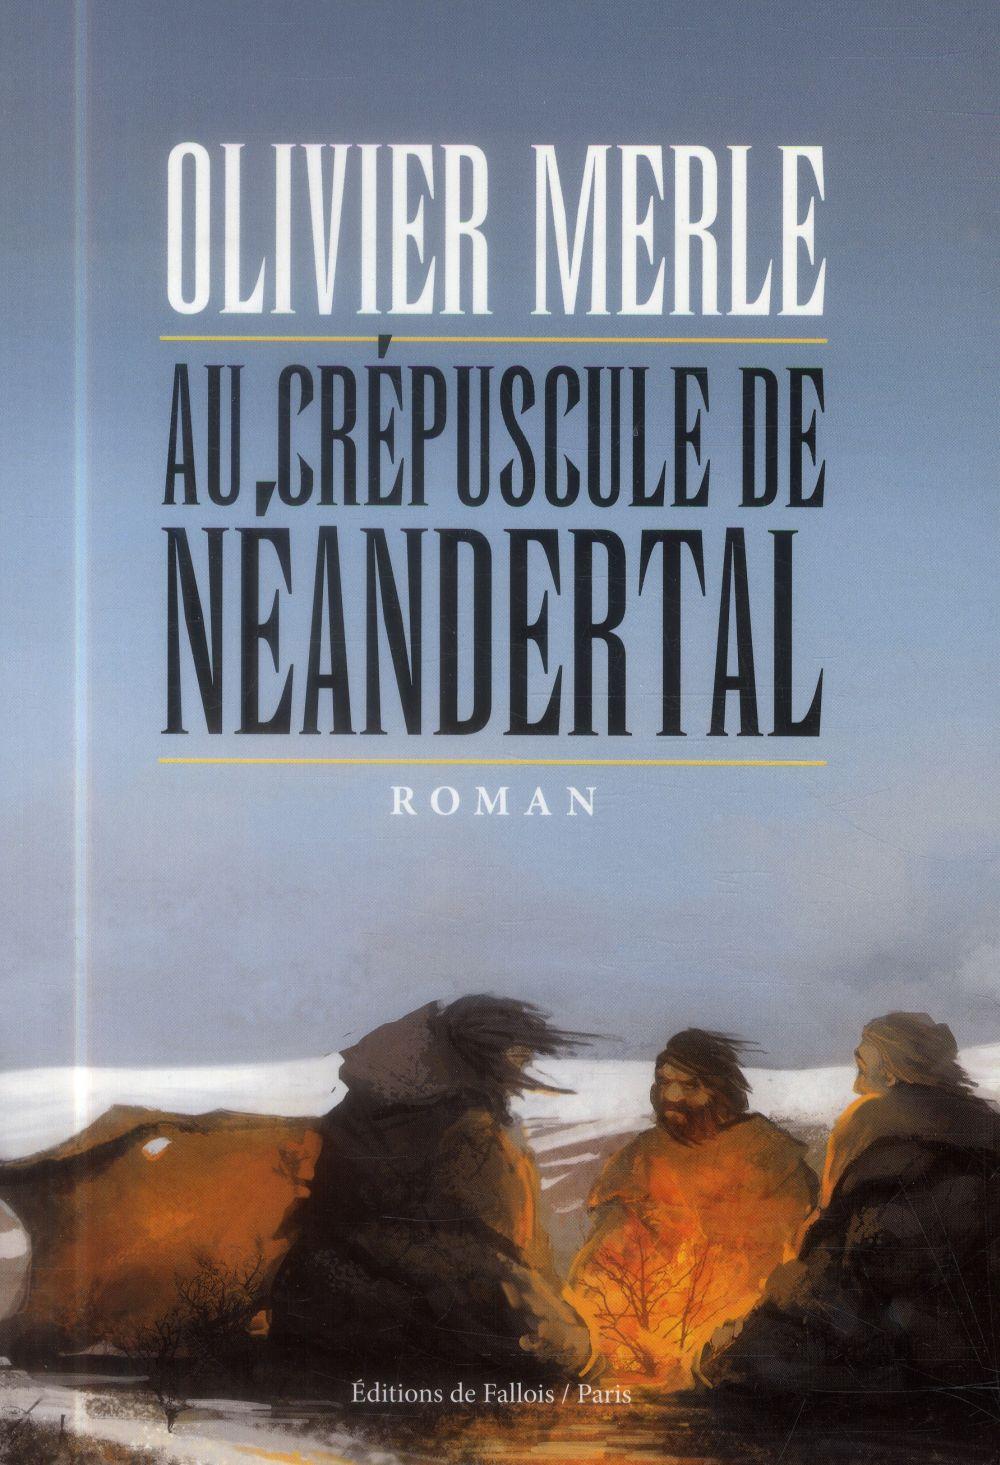 AU CREPUSCULE DE NEANDERTAL